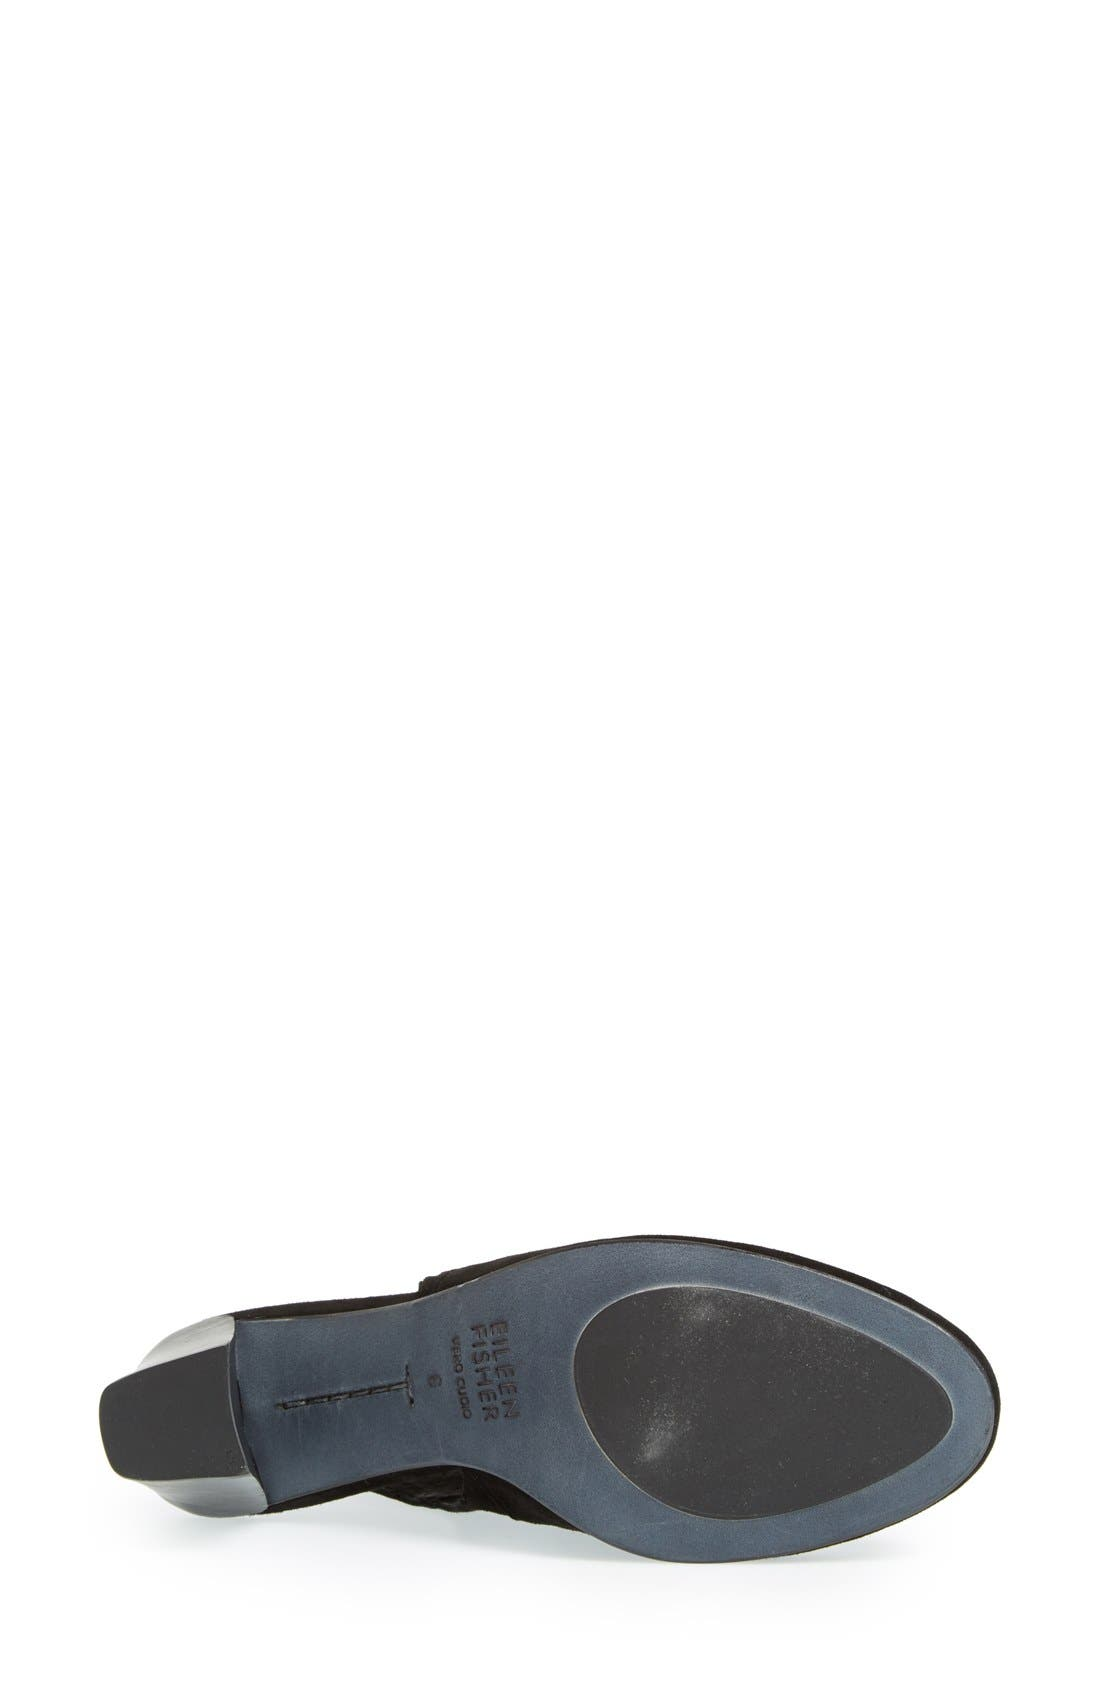 Alternate Image 4  - Eileen Fisher 'Ideal' Cutout Bootie (Women) (Online Only)